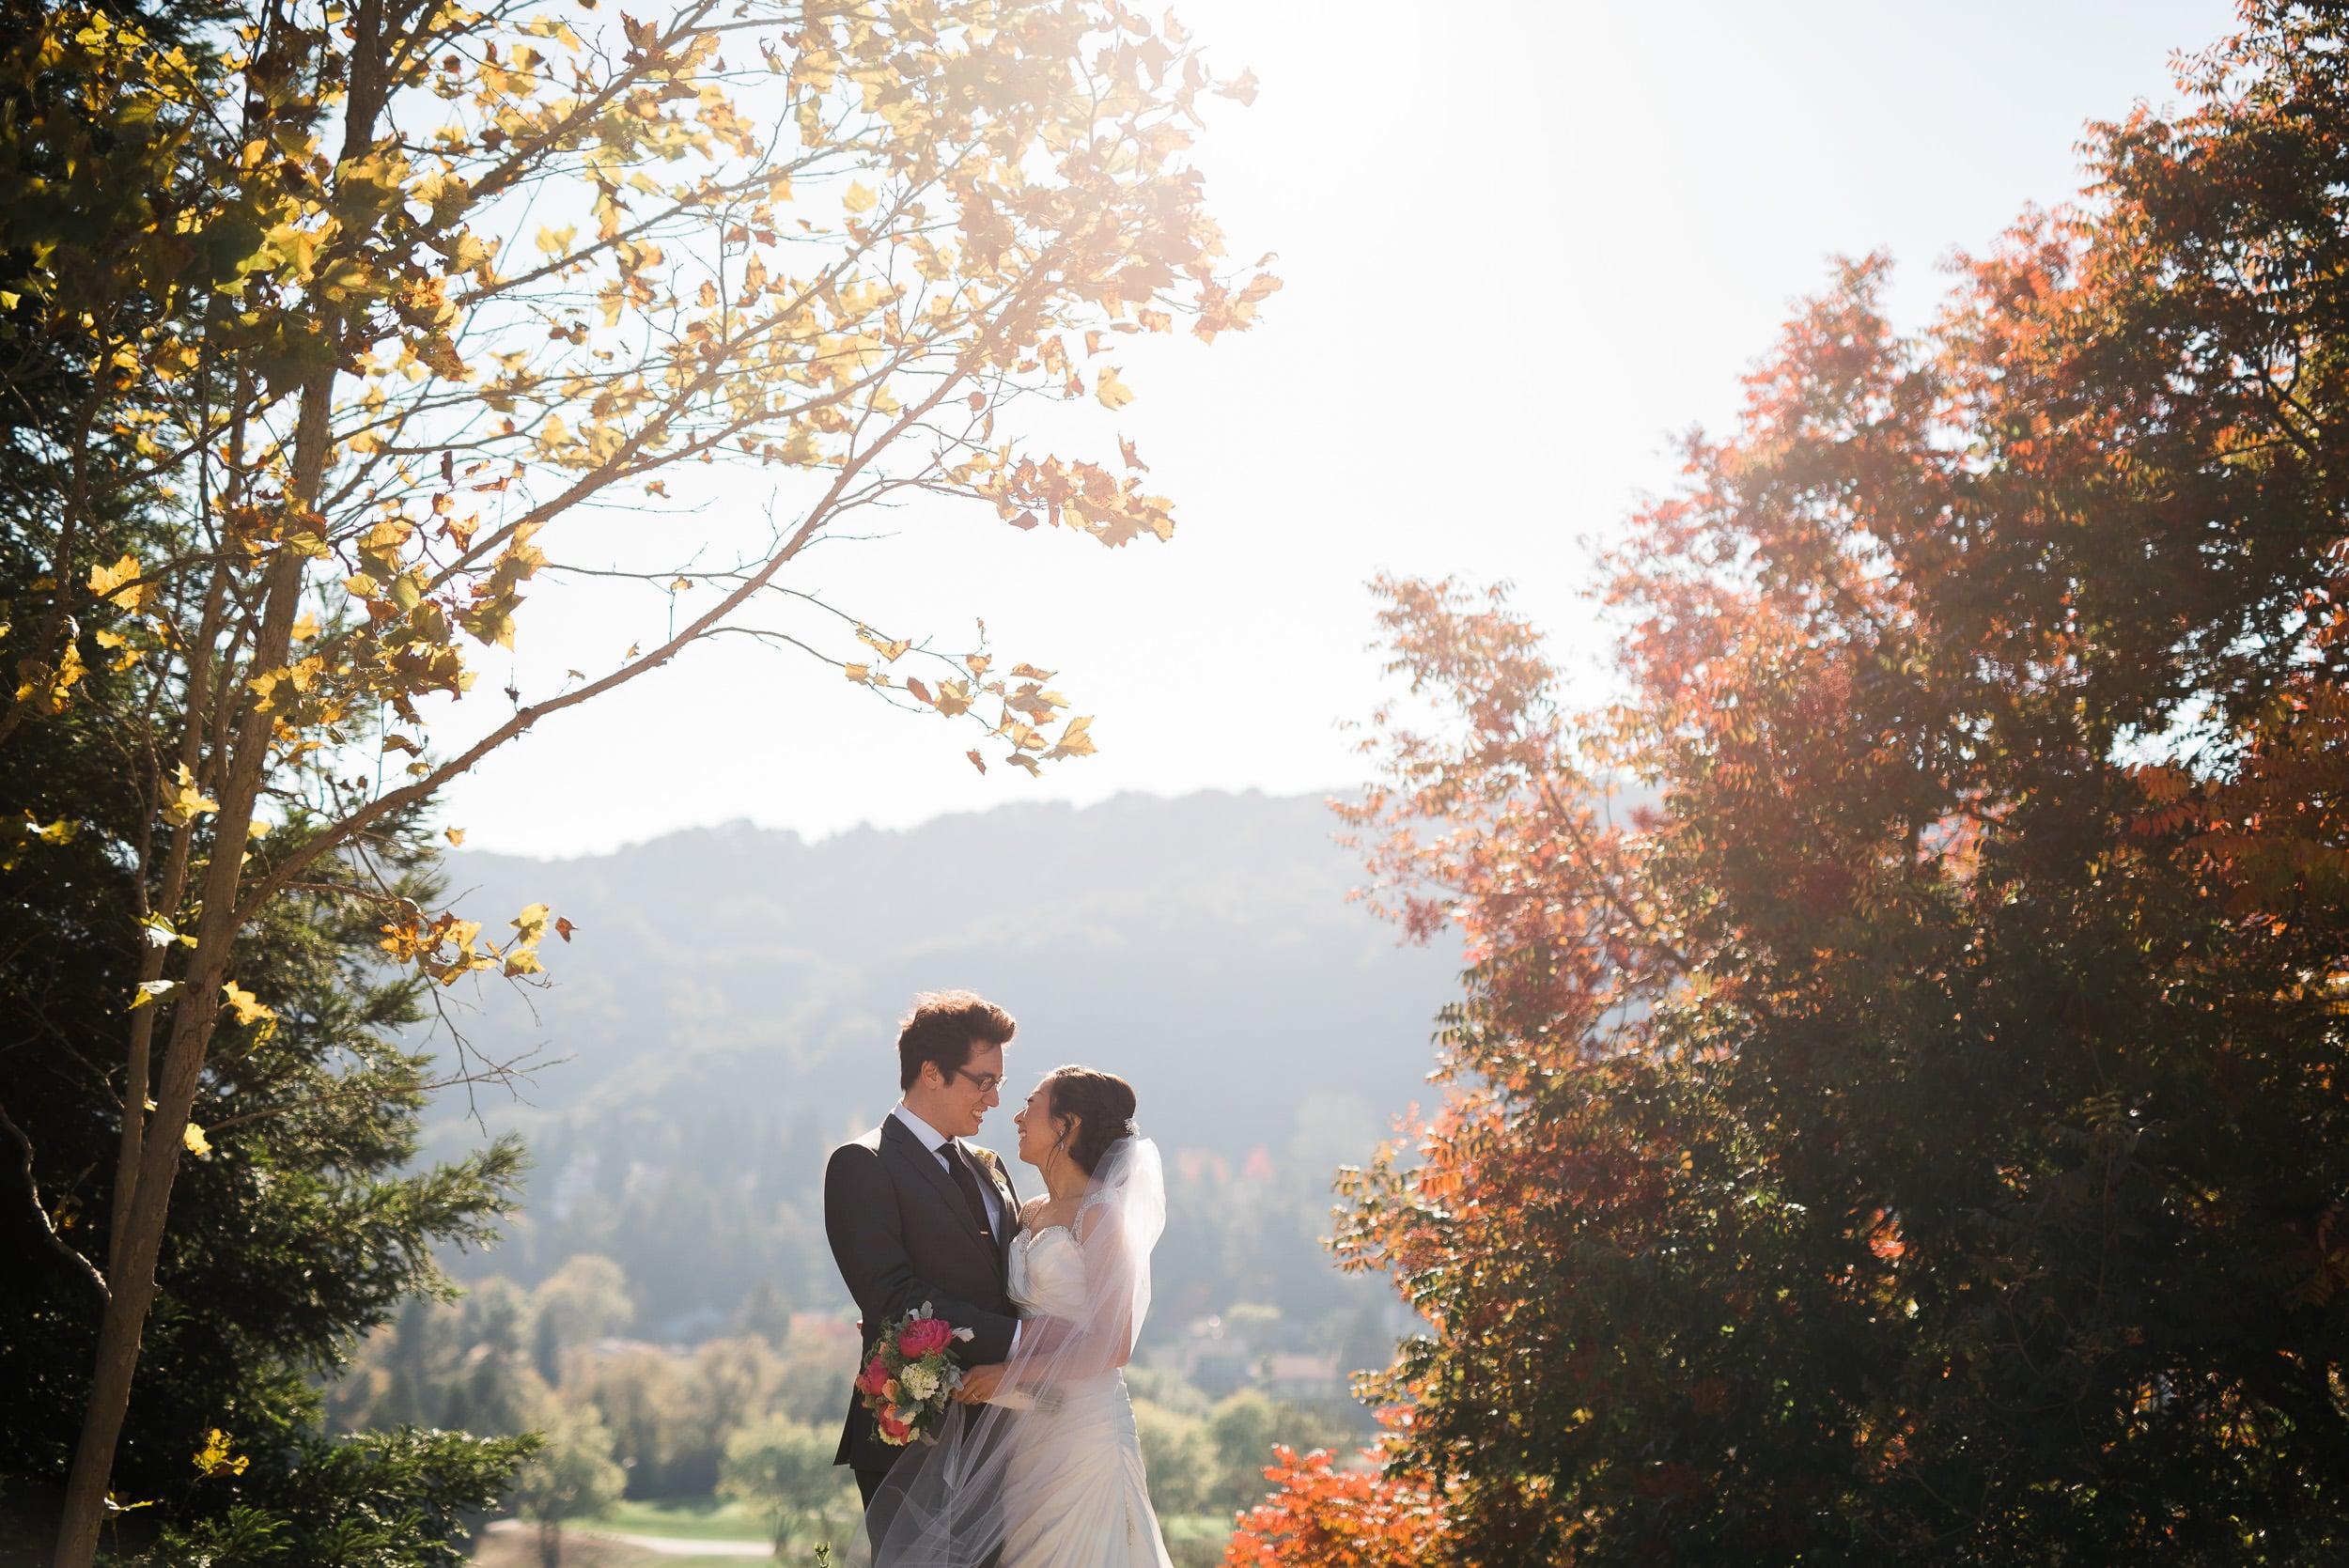 Moraga Valley Church wedding 014.jpg